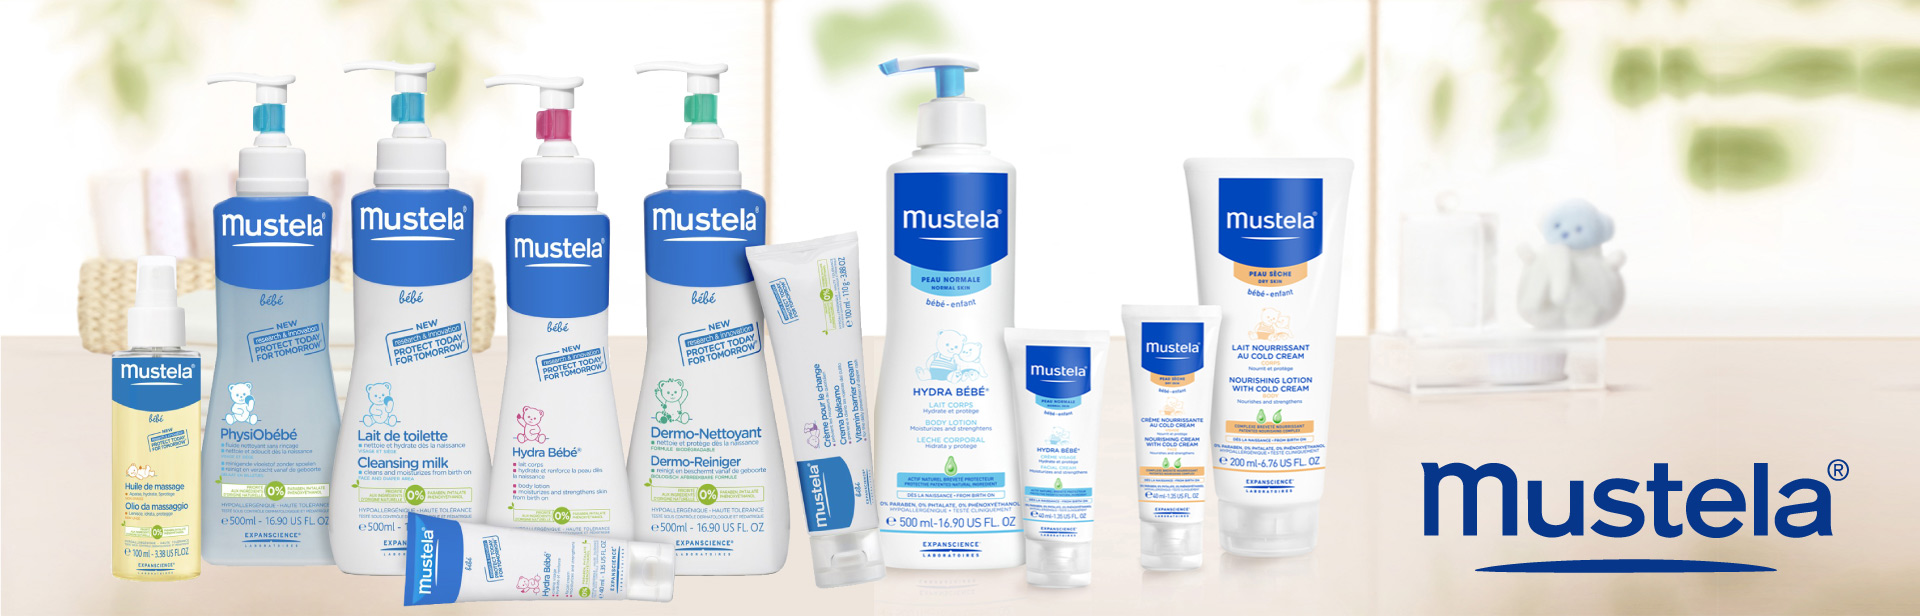 Farmacia Sagrada - Dermocosmesi naturale - Mustela